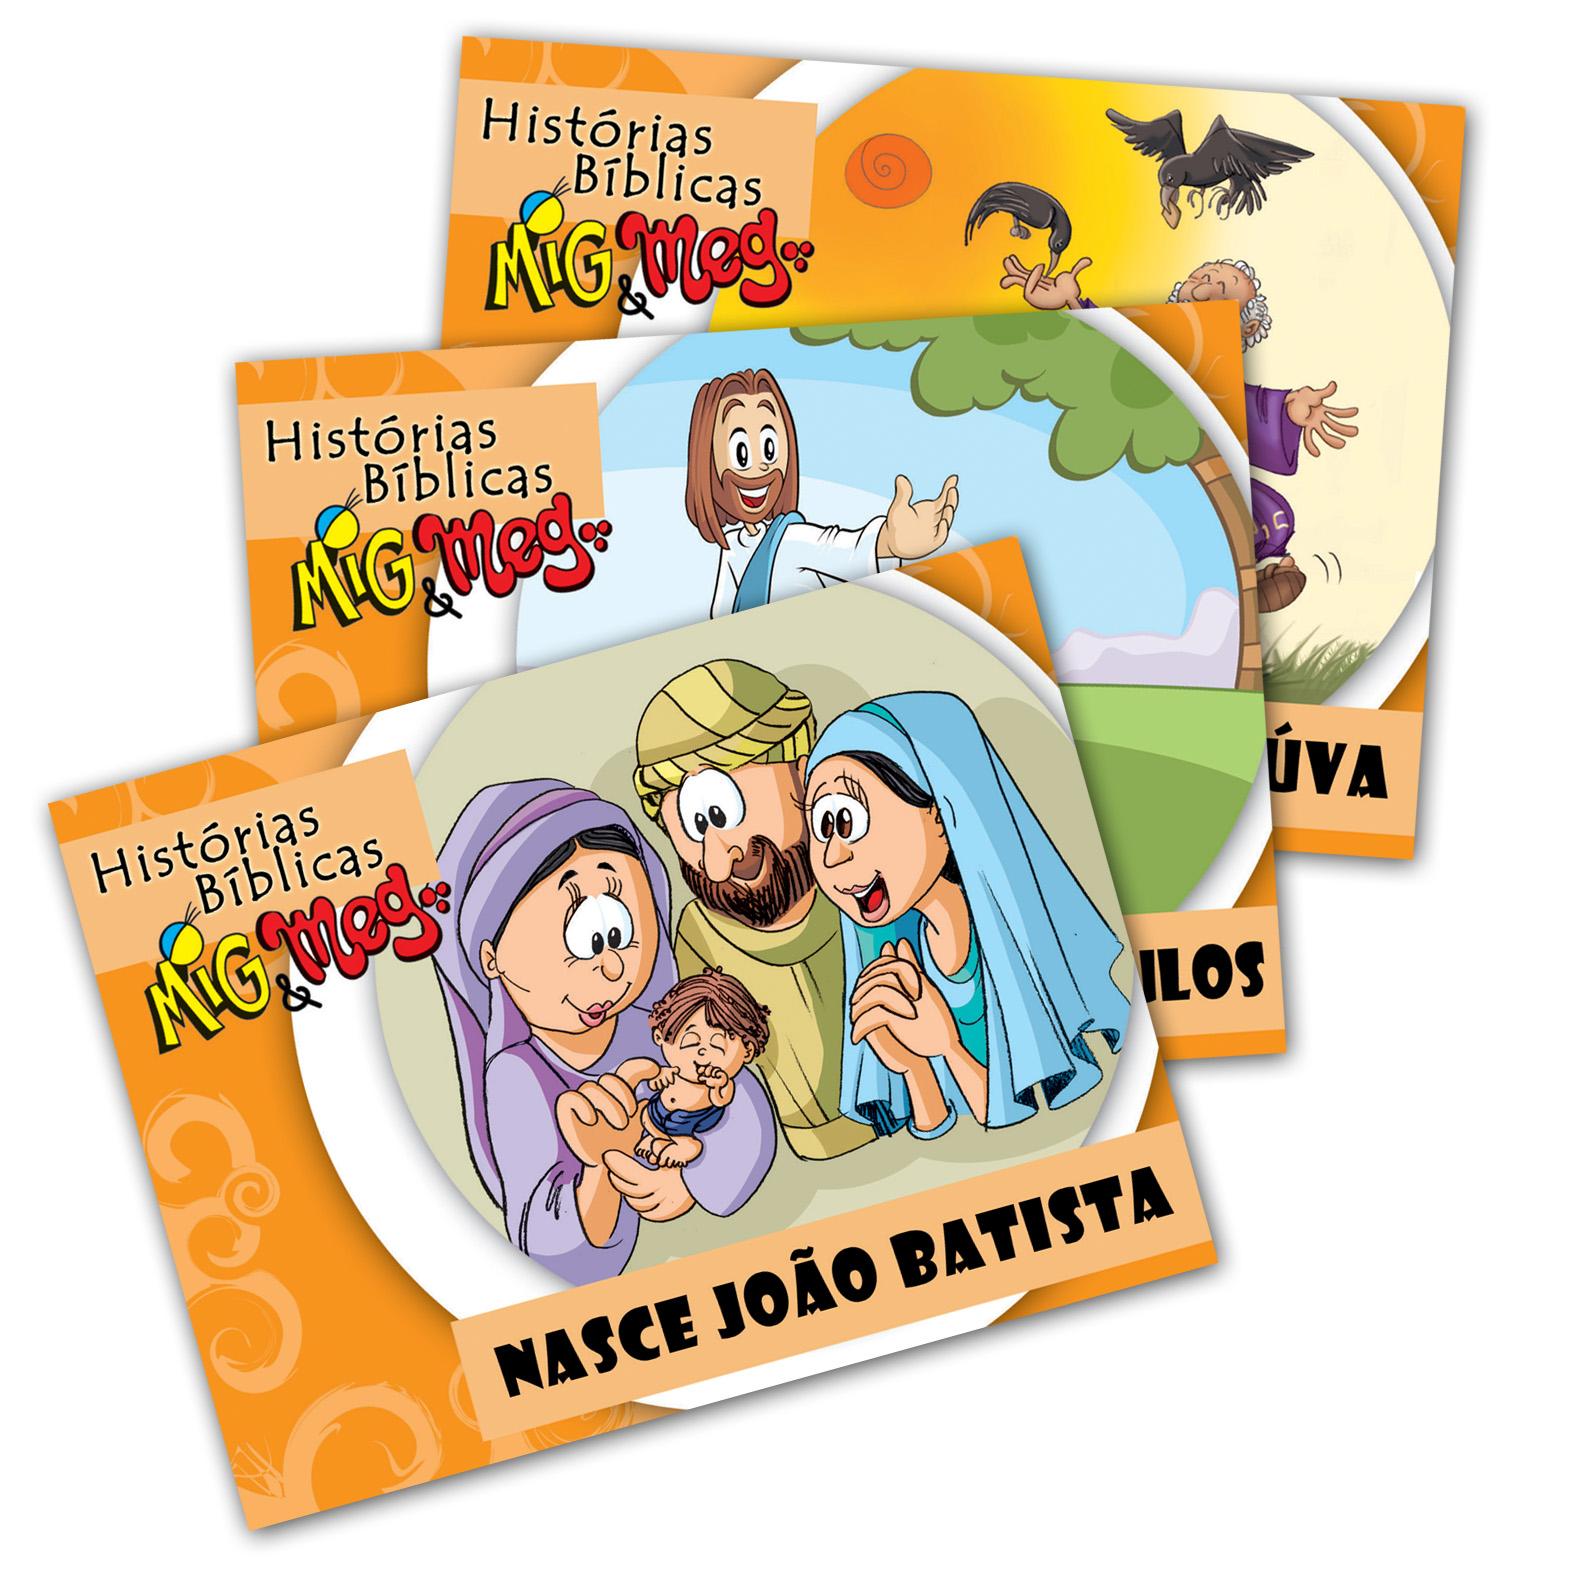 http://1.bp.blogspot.com/_khzMNtvIVJ0/TMscOcUraSI/AAAAAAAAAZU/62J4JT4KM_U/s1600/MigMeg_Historias-Biblicas.jpg